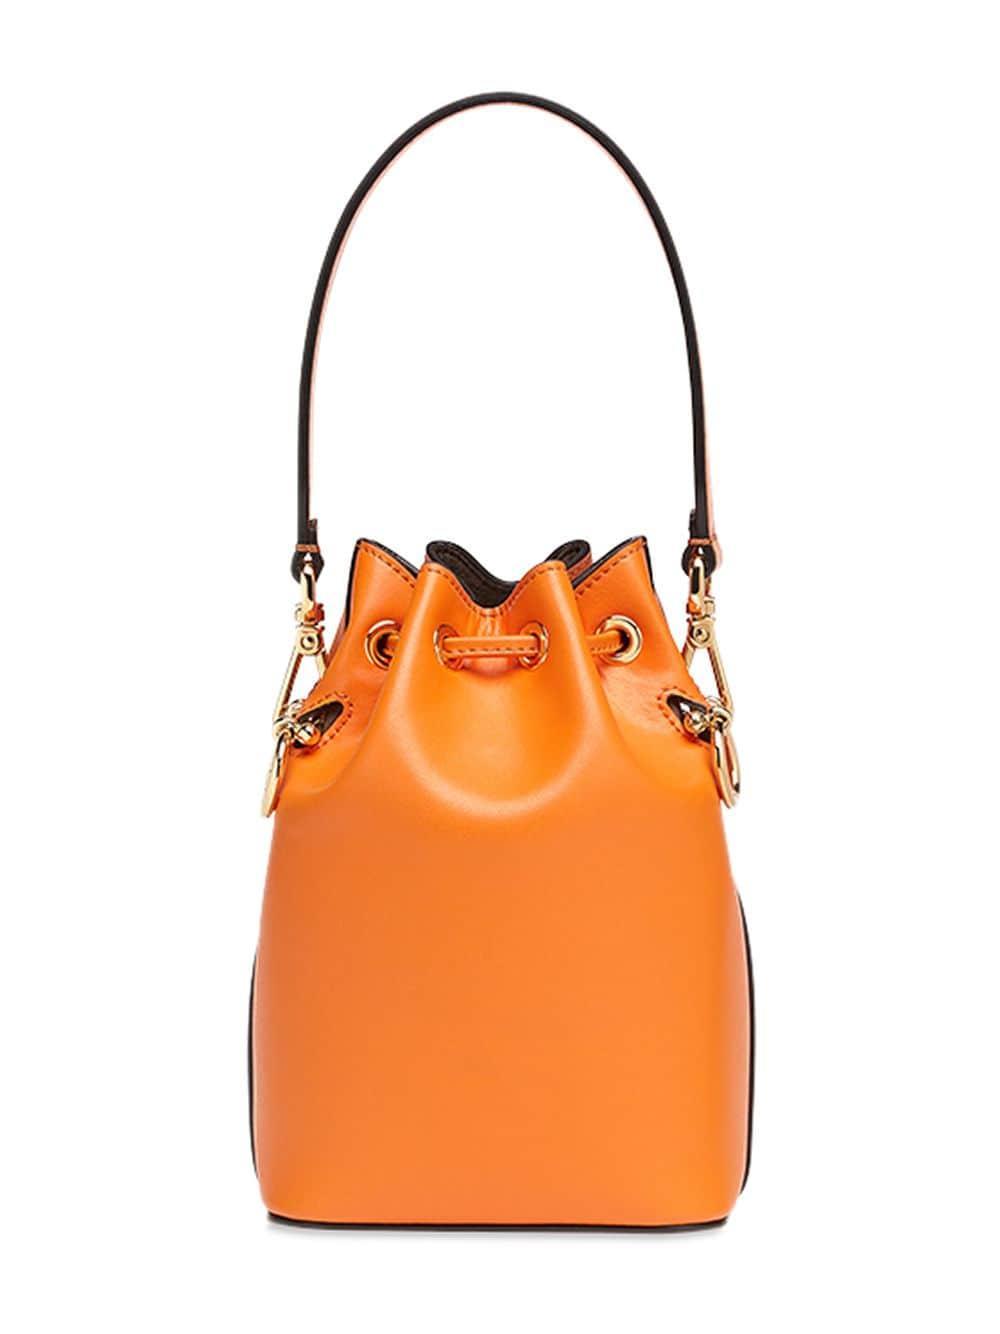 Fendi Mon Tresor Mini Bucket Bag in Orange - Lyst fa102b1998905